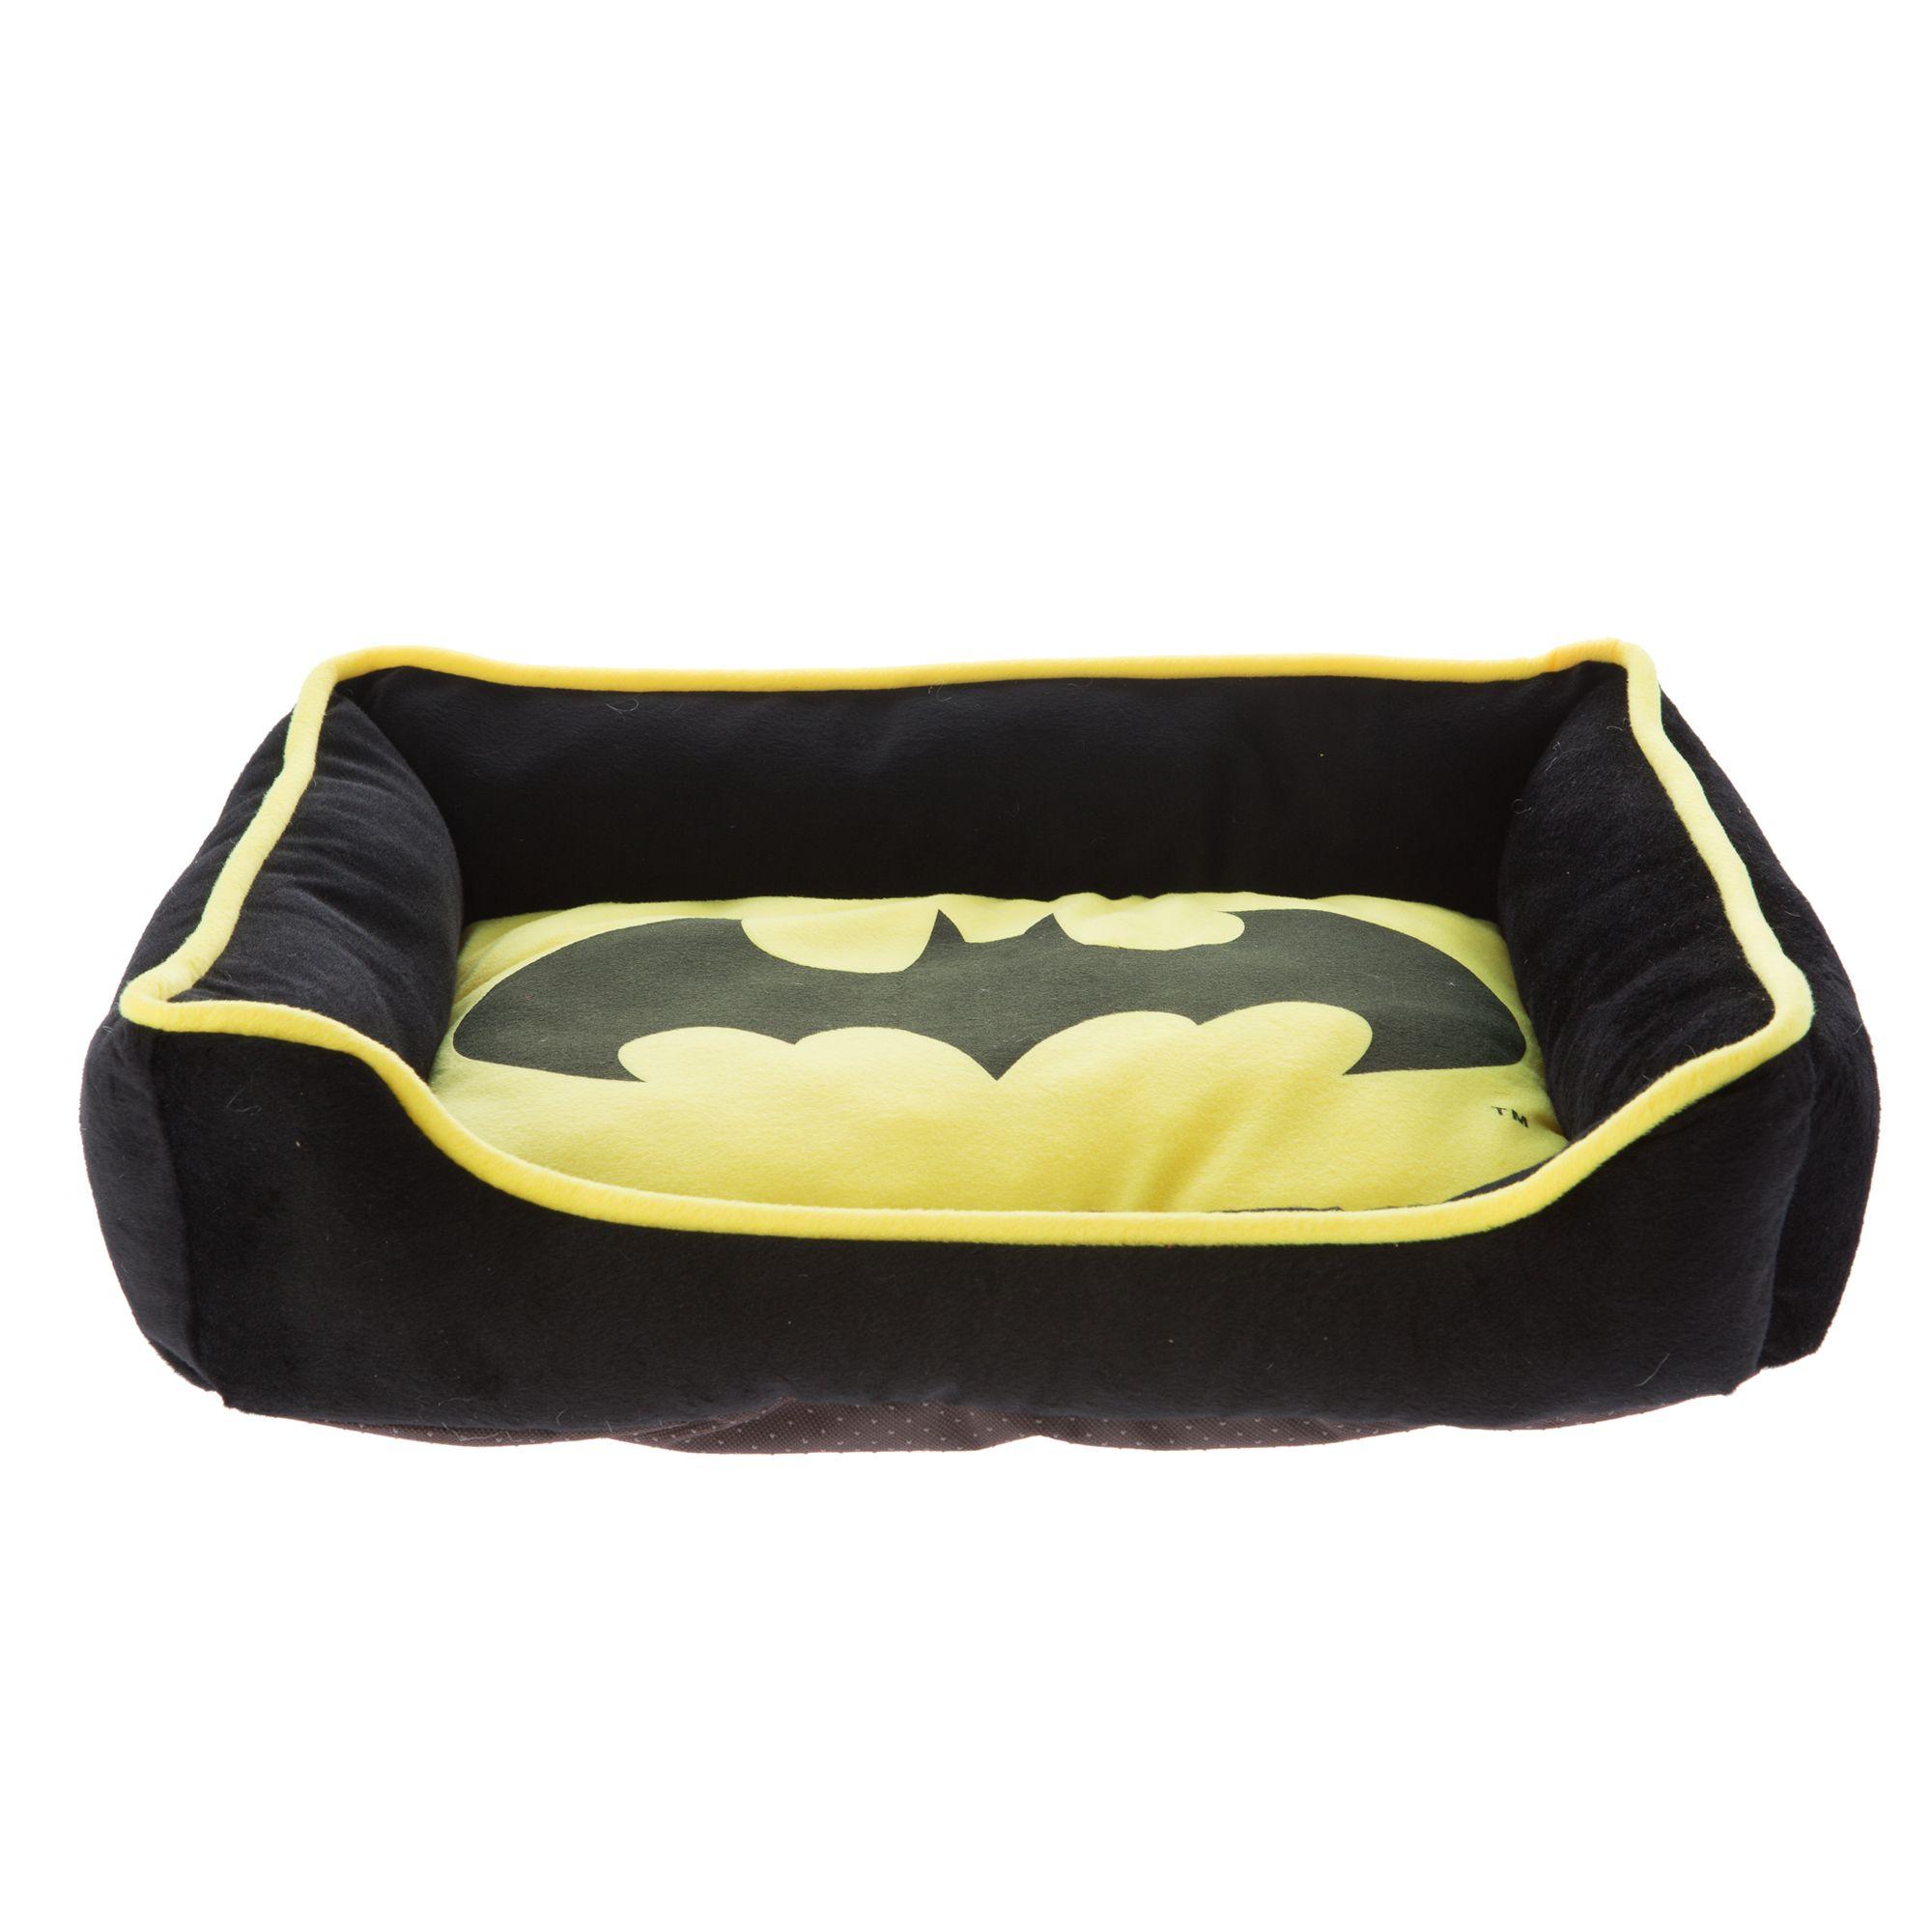 Dc Comics Batman Cuddler Dog Bed Size 19l X 15w